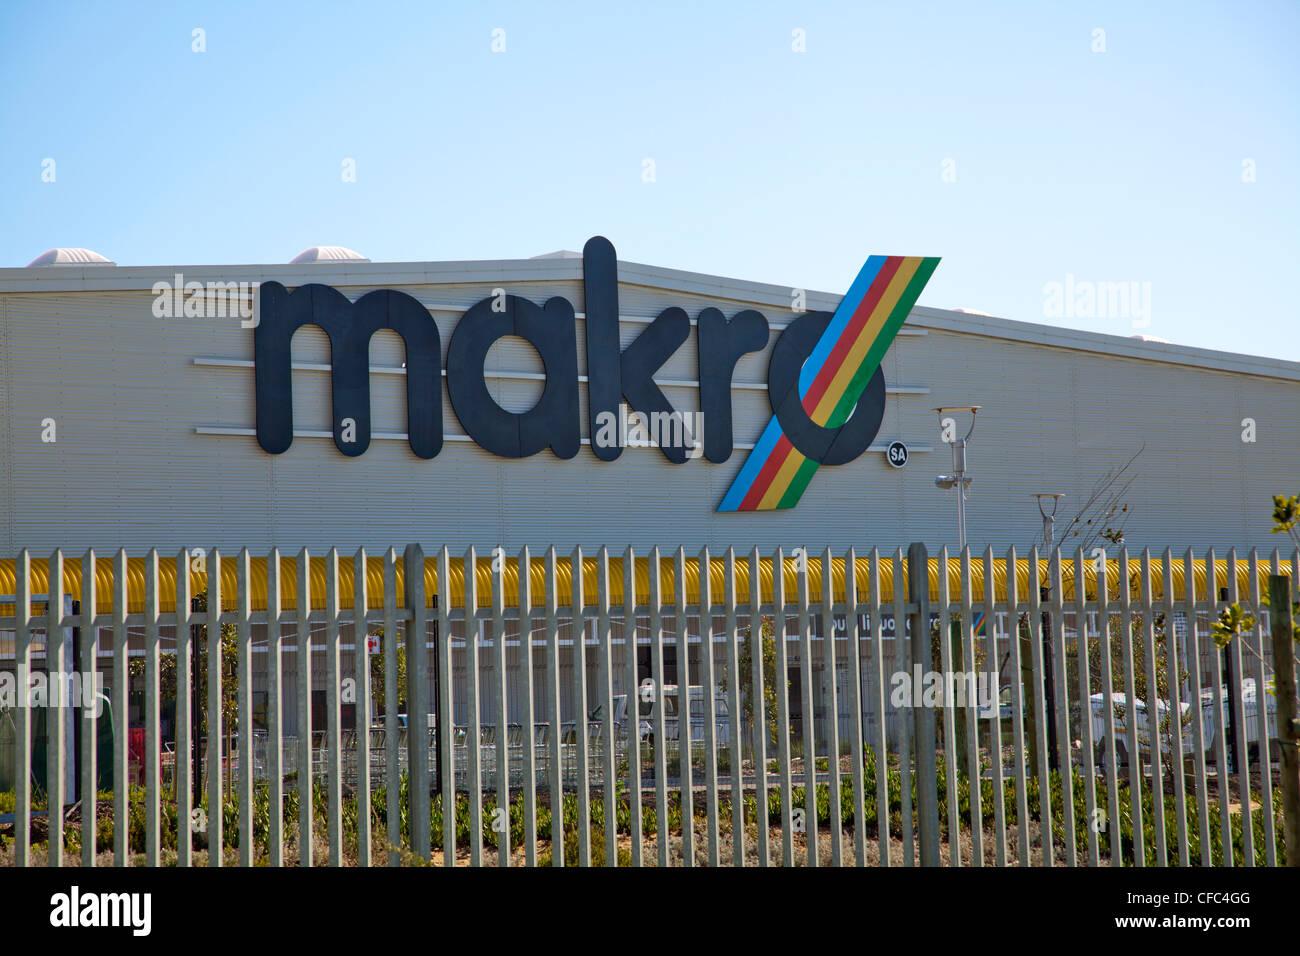 Large Makro Store in Milnerton - Cape Town - Stock Image